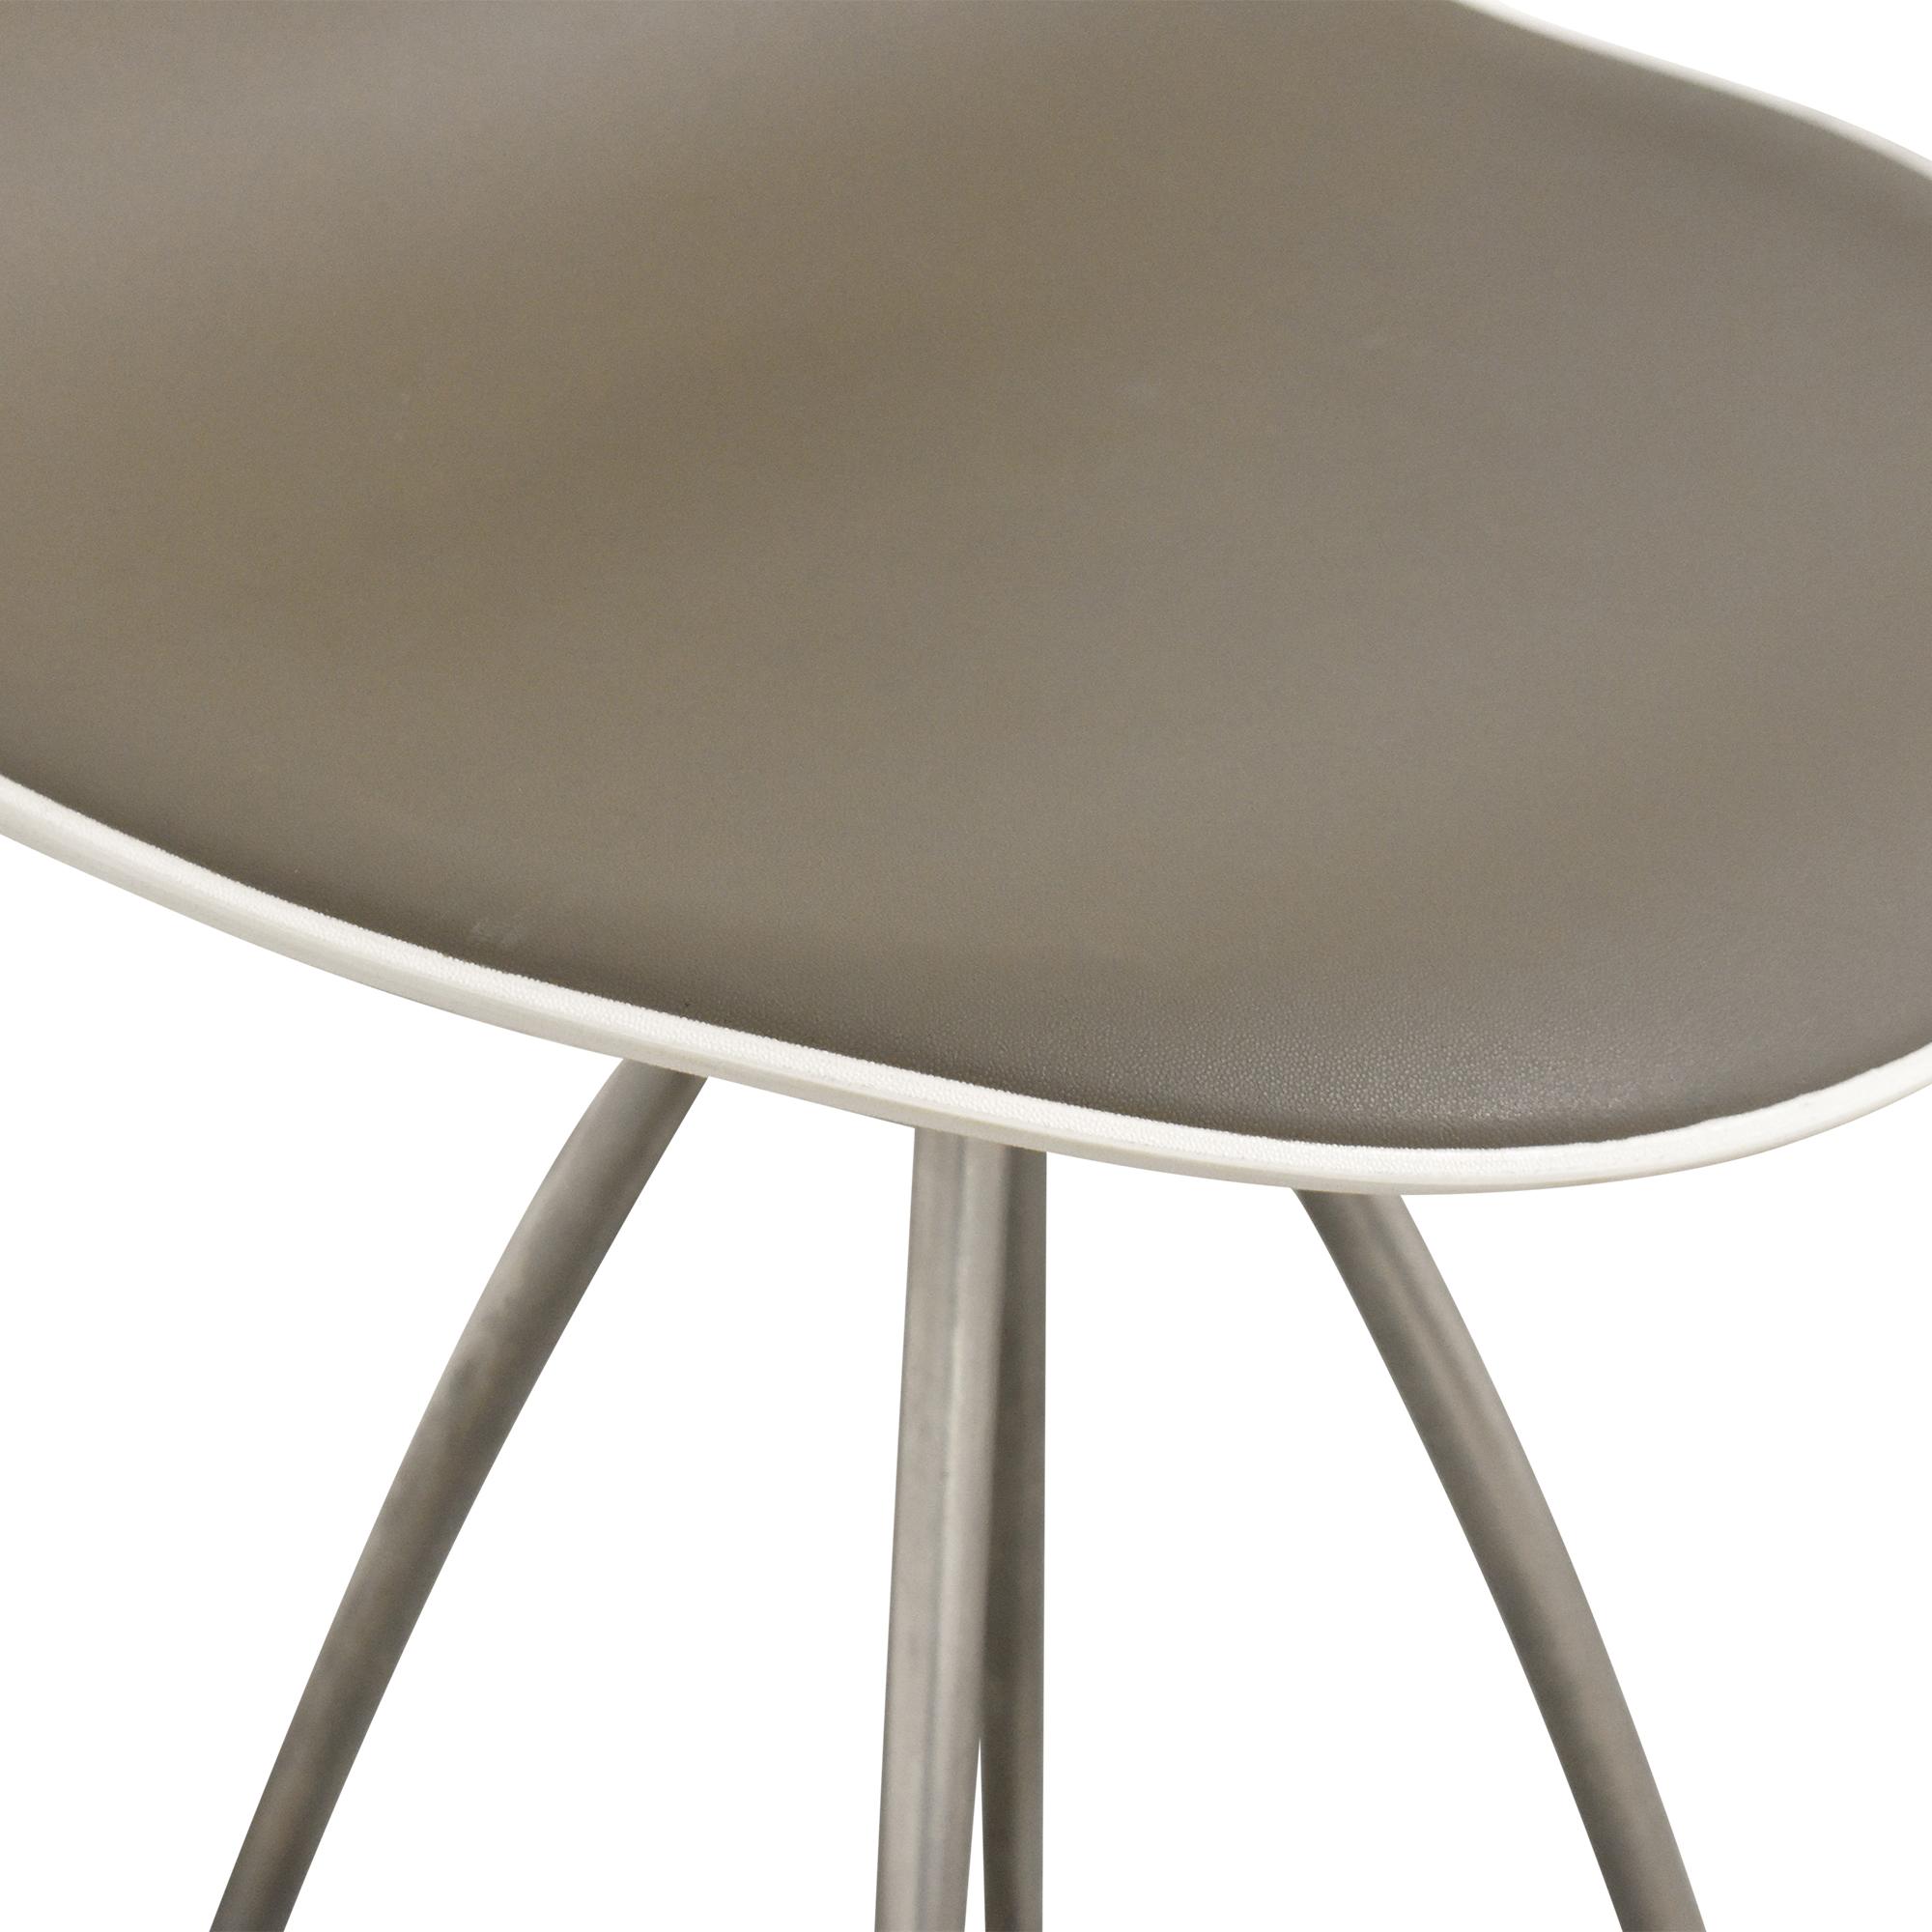 Design Within Reach Design Within Reach Onda Counter Stool nj